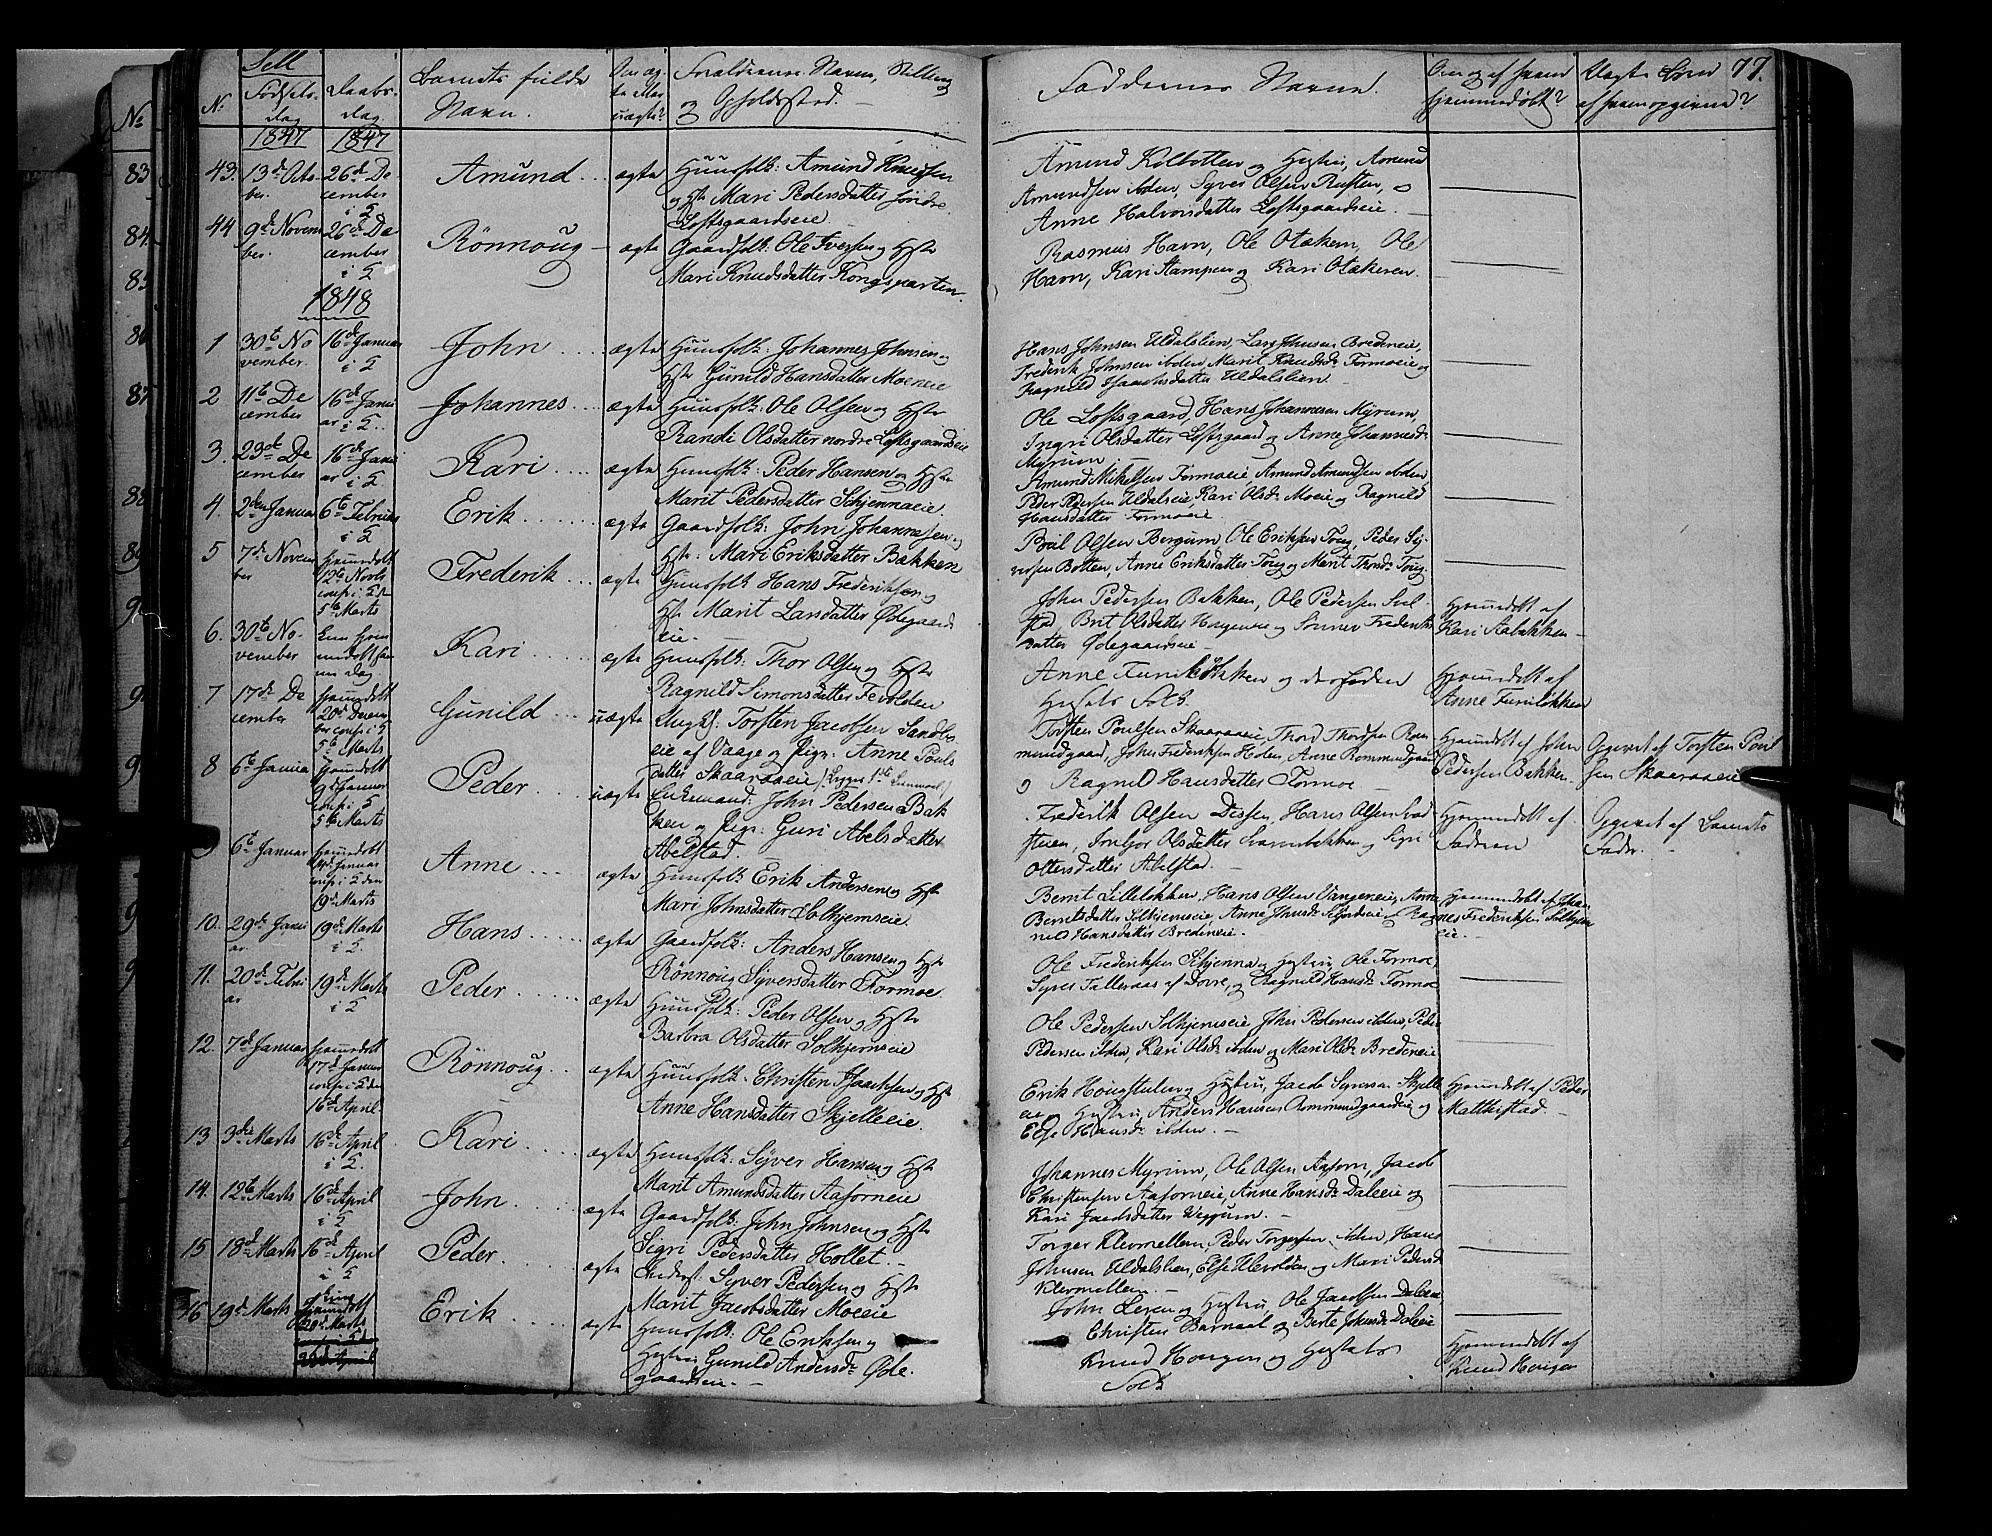 SAH, Vågå prestekontor, Ministerialbok nr. 5 /3, 1842-1856, s. 77